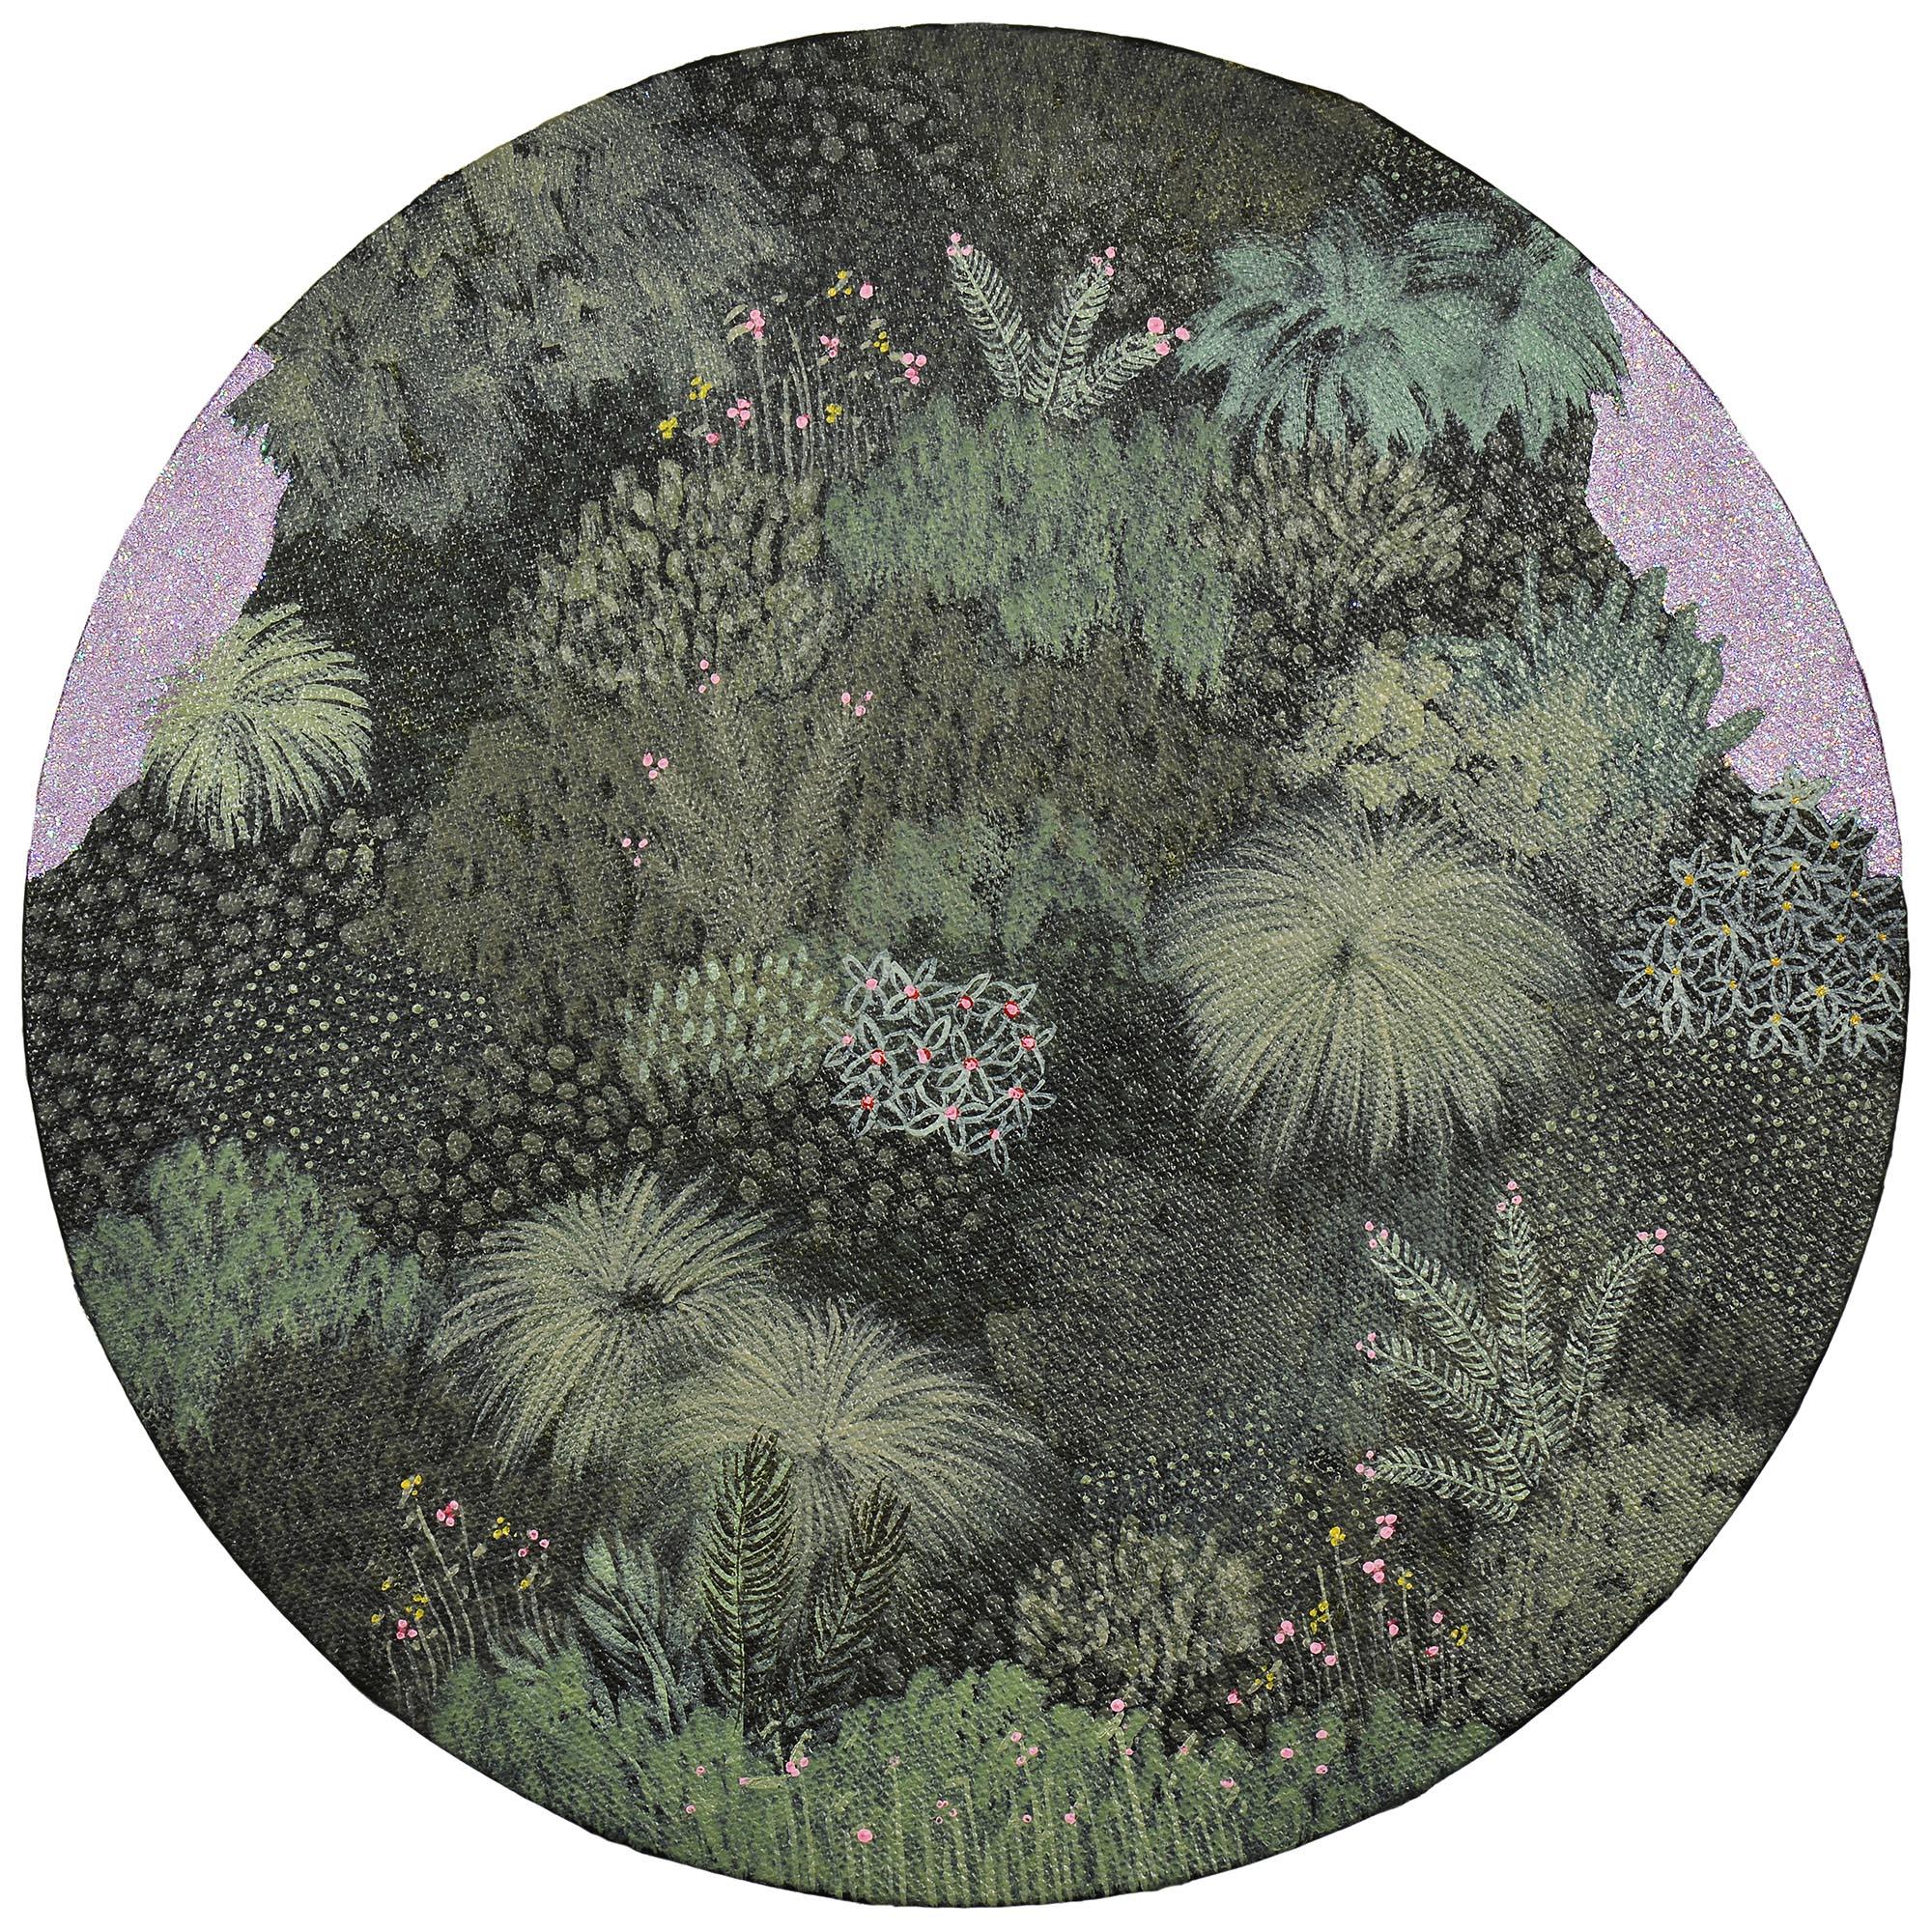 Marc Standing, Wilderness 5 , 2016, acrylic on canvas, 30 x 30 cm